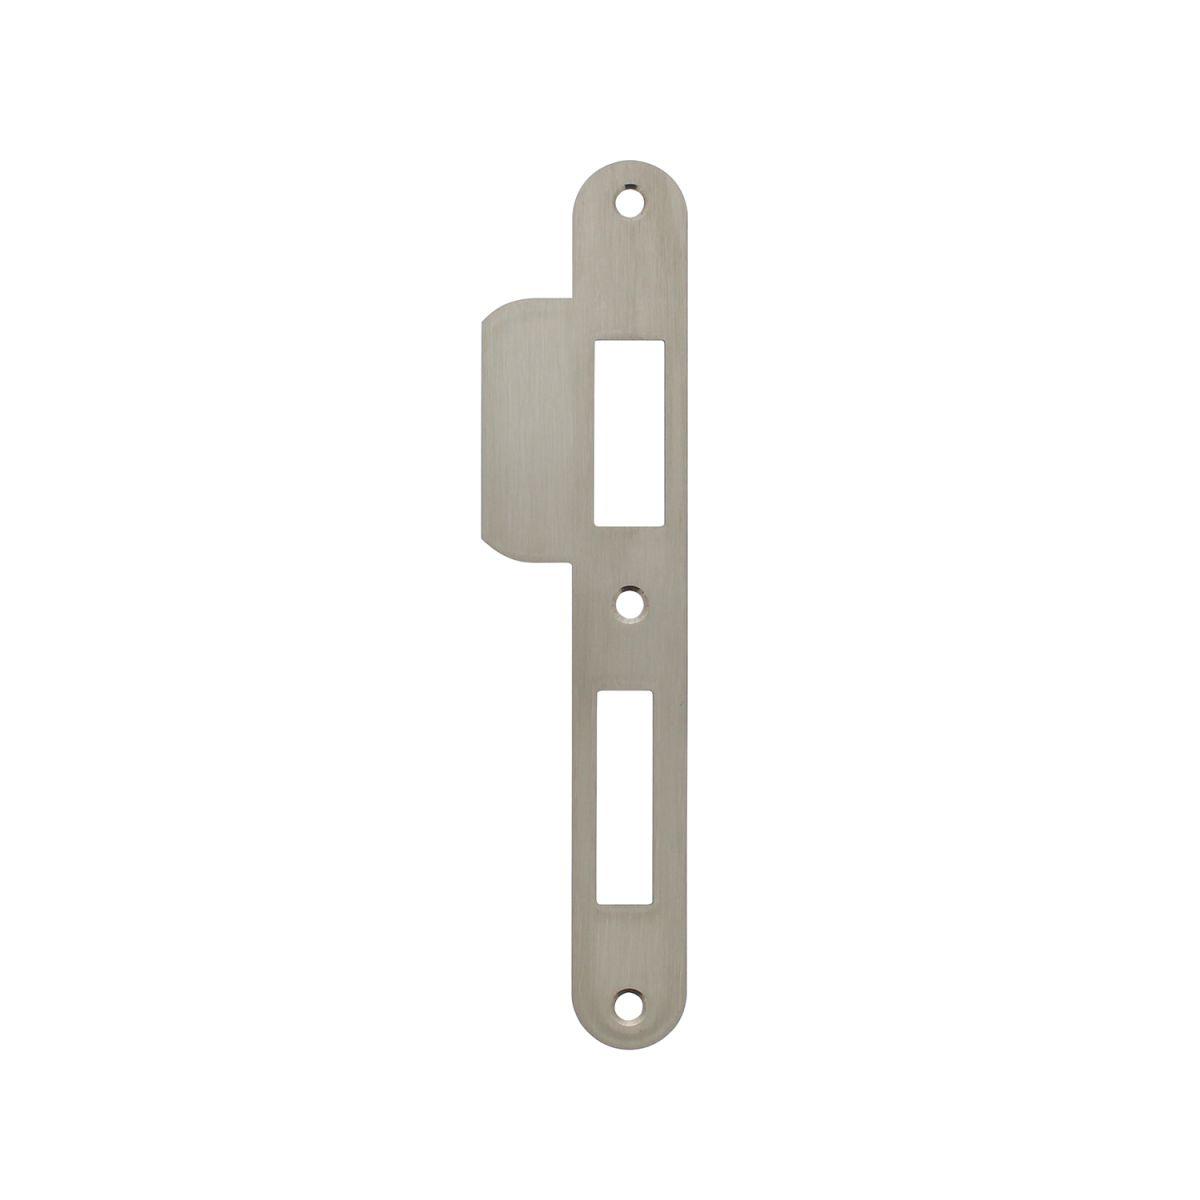 strike plate vhc lock 72 mm left stainless steel